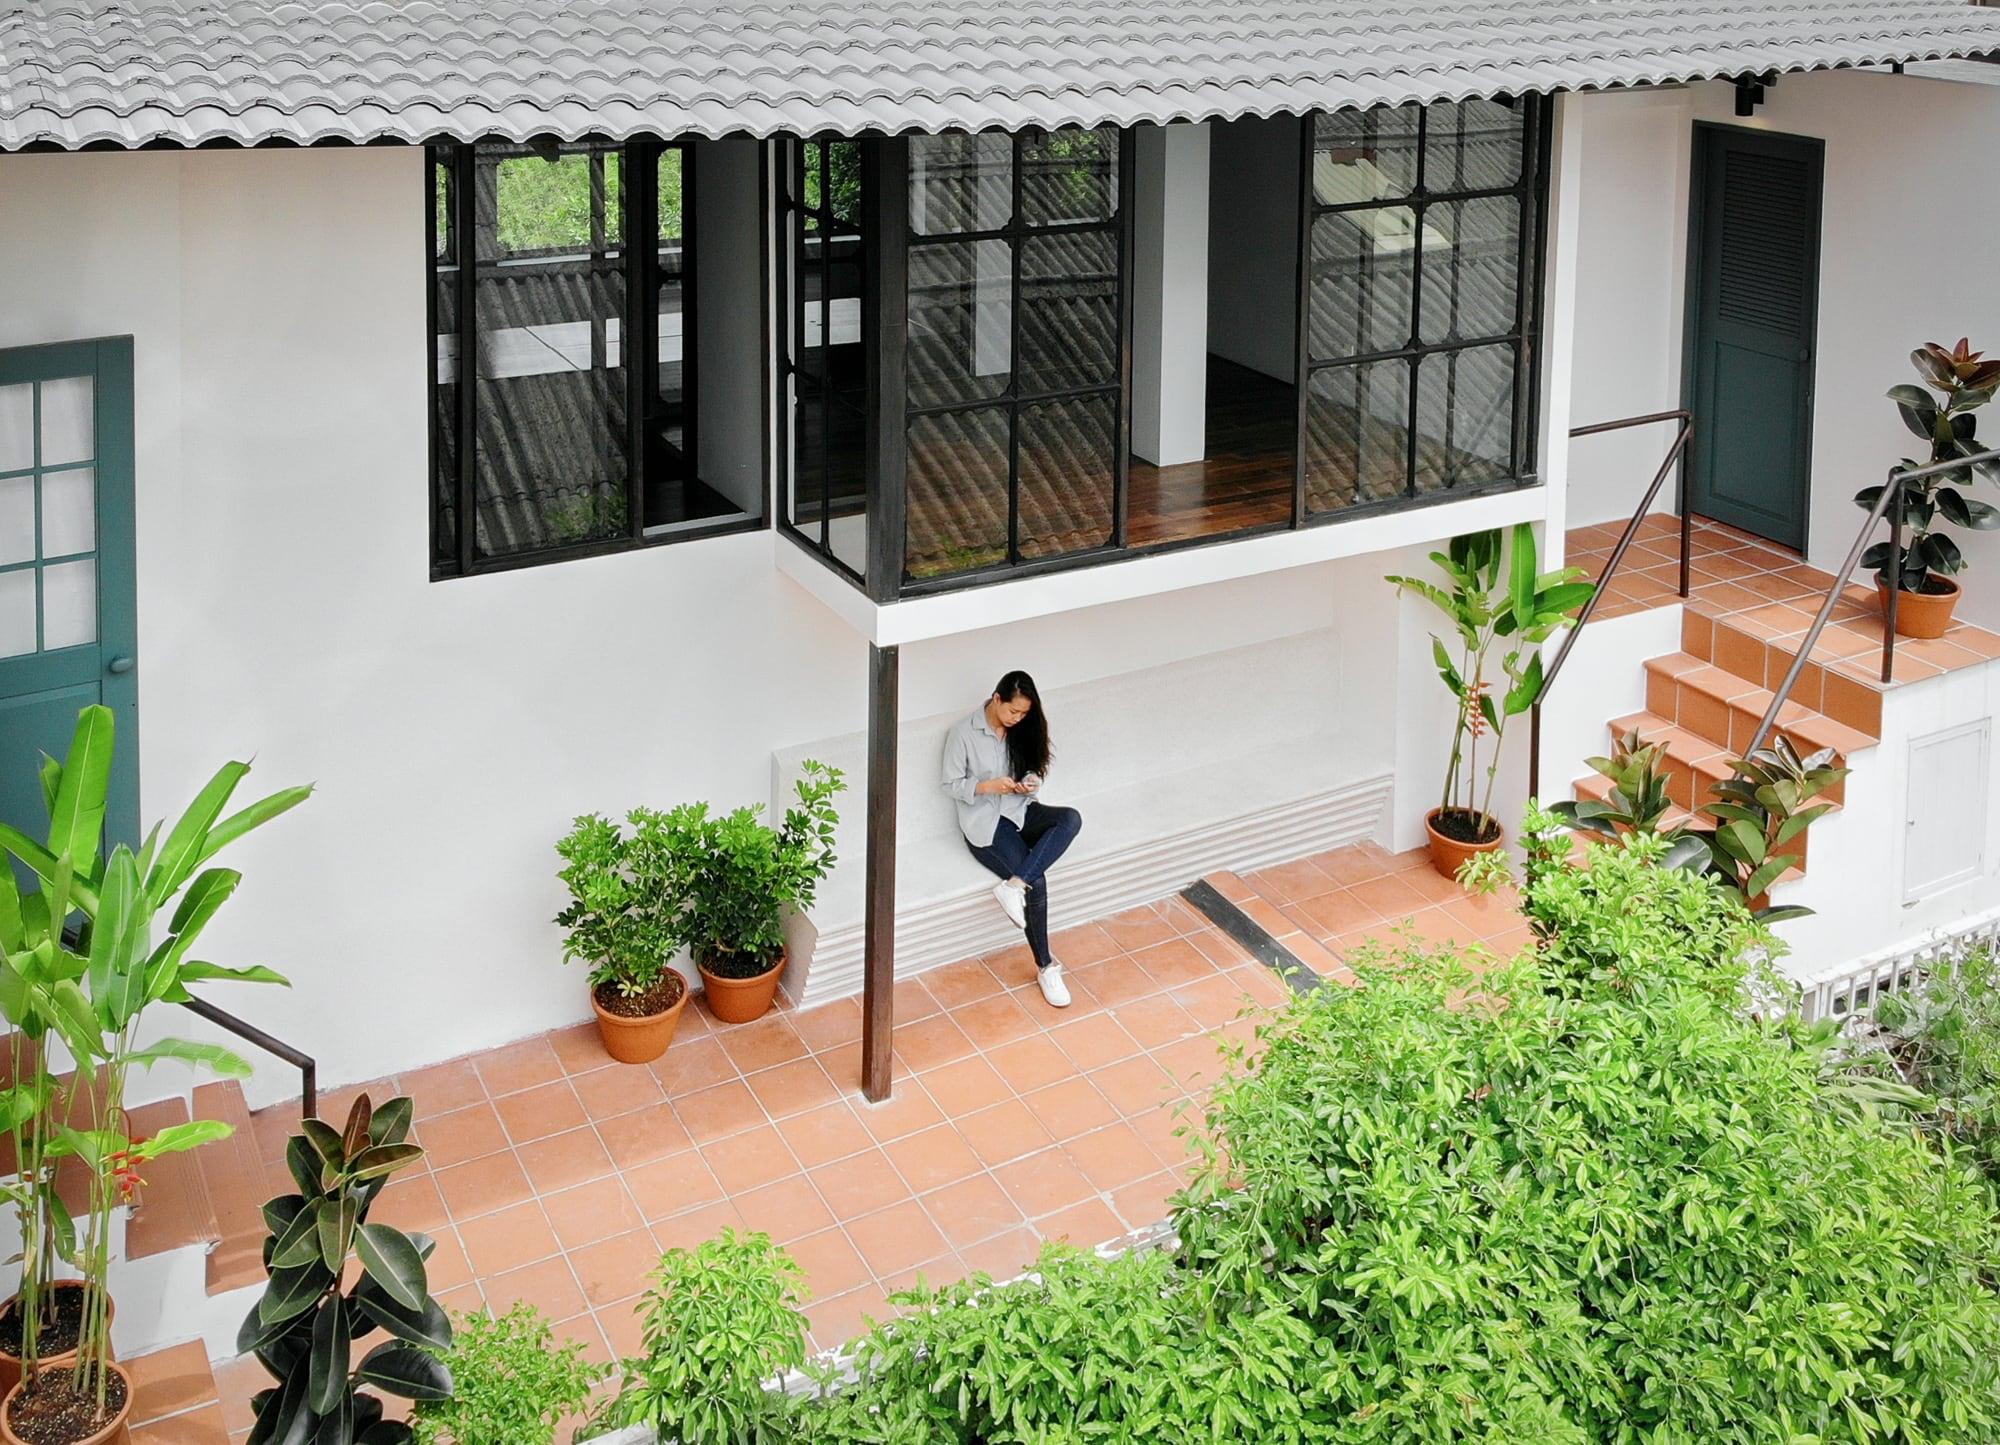 Vietcetera Office